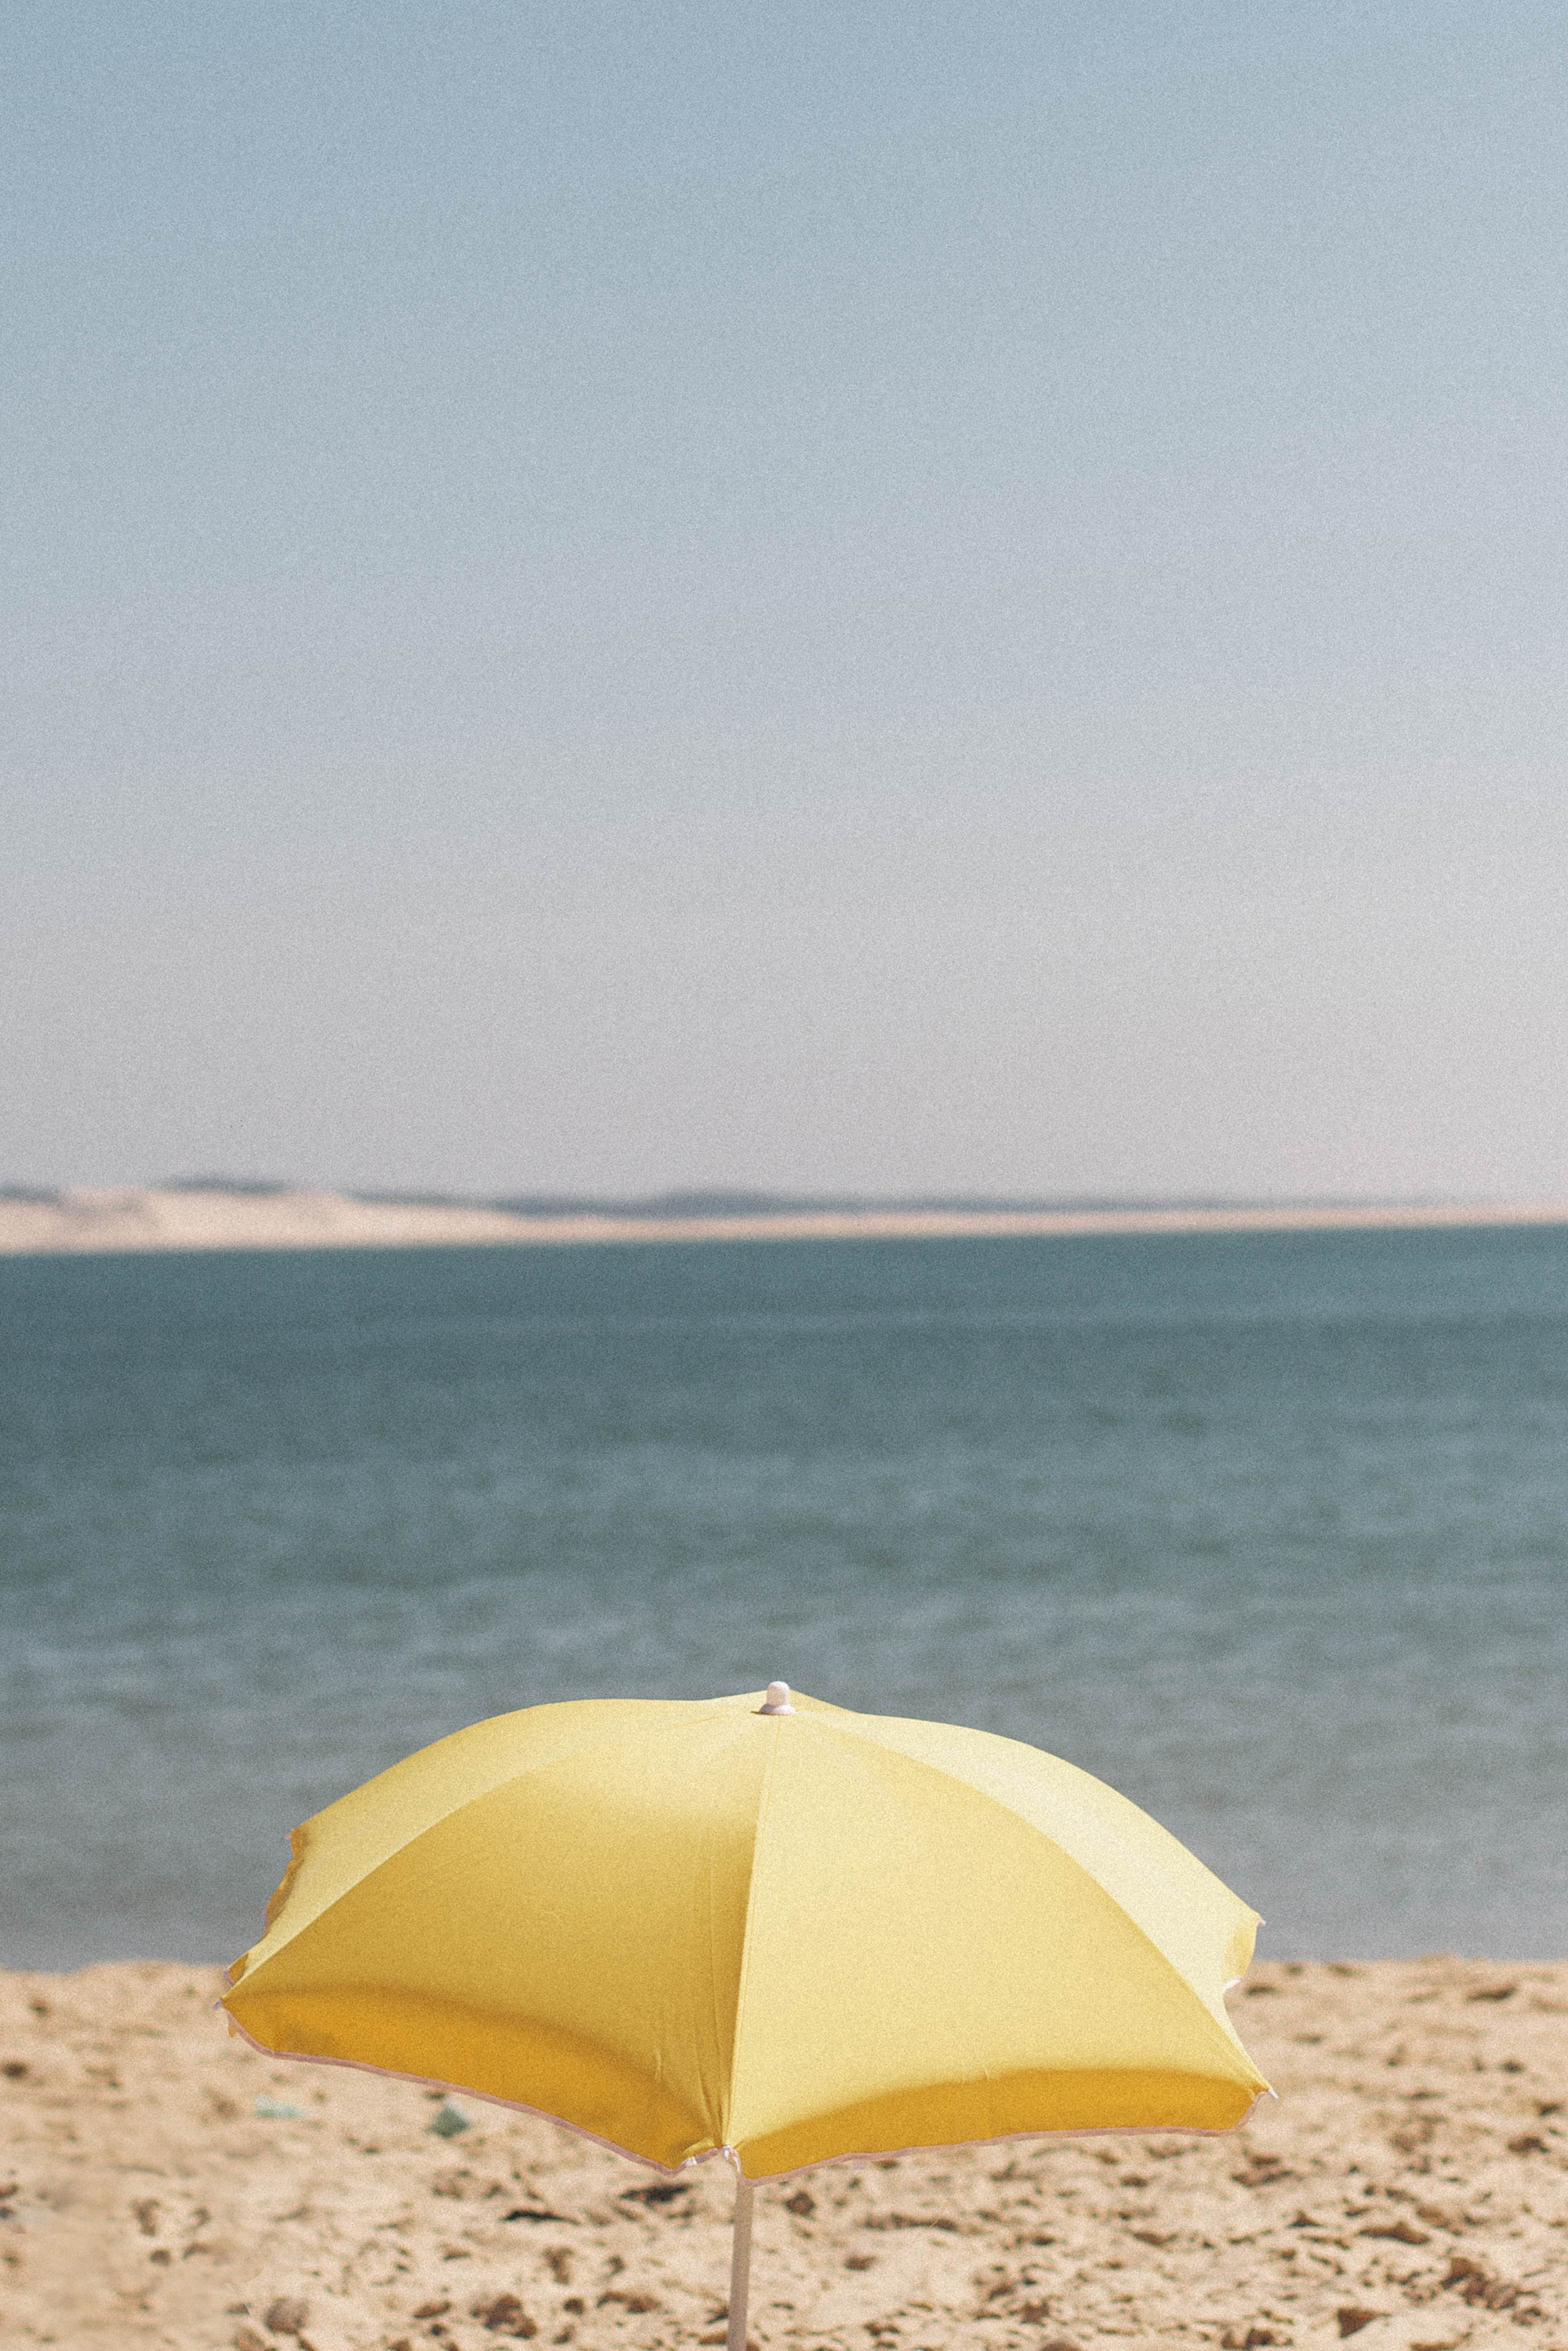 Mimi_hammer-la babineau-beach life- beach photography-lifestyle-travel-girls-portrait of a girl-beach-swimsuits-15